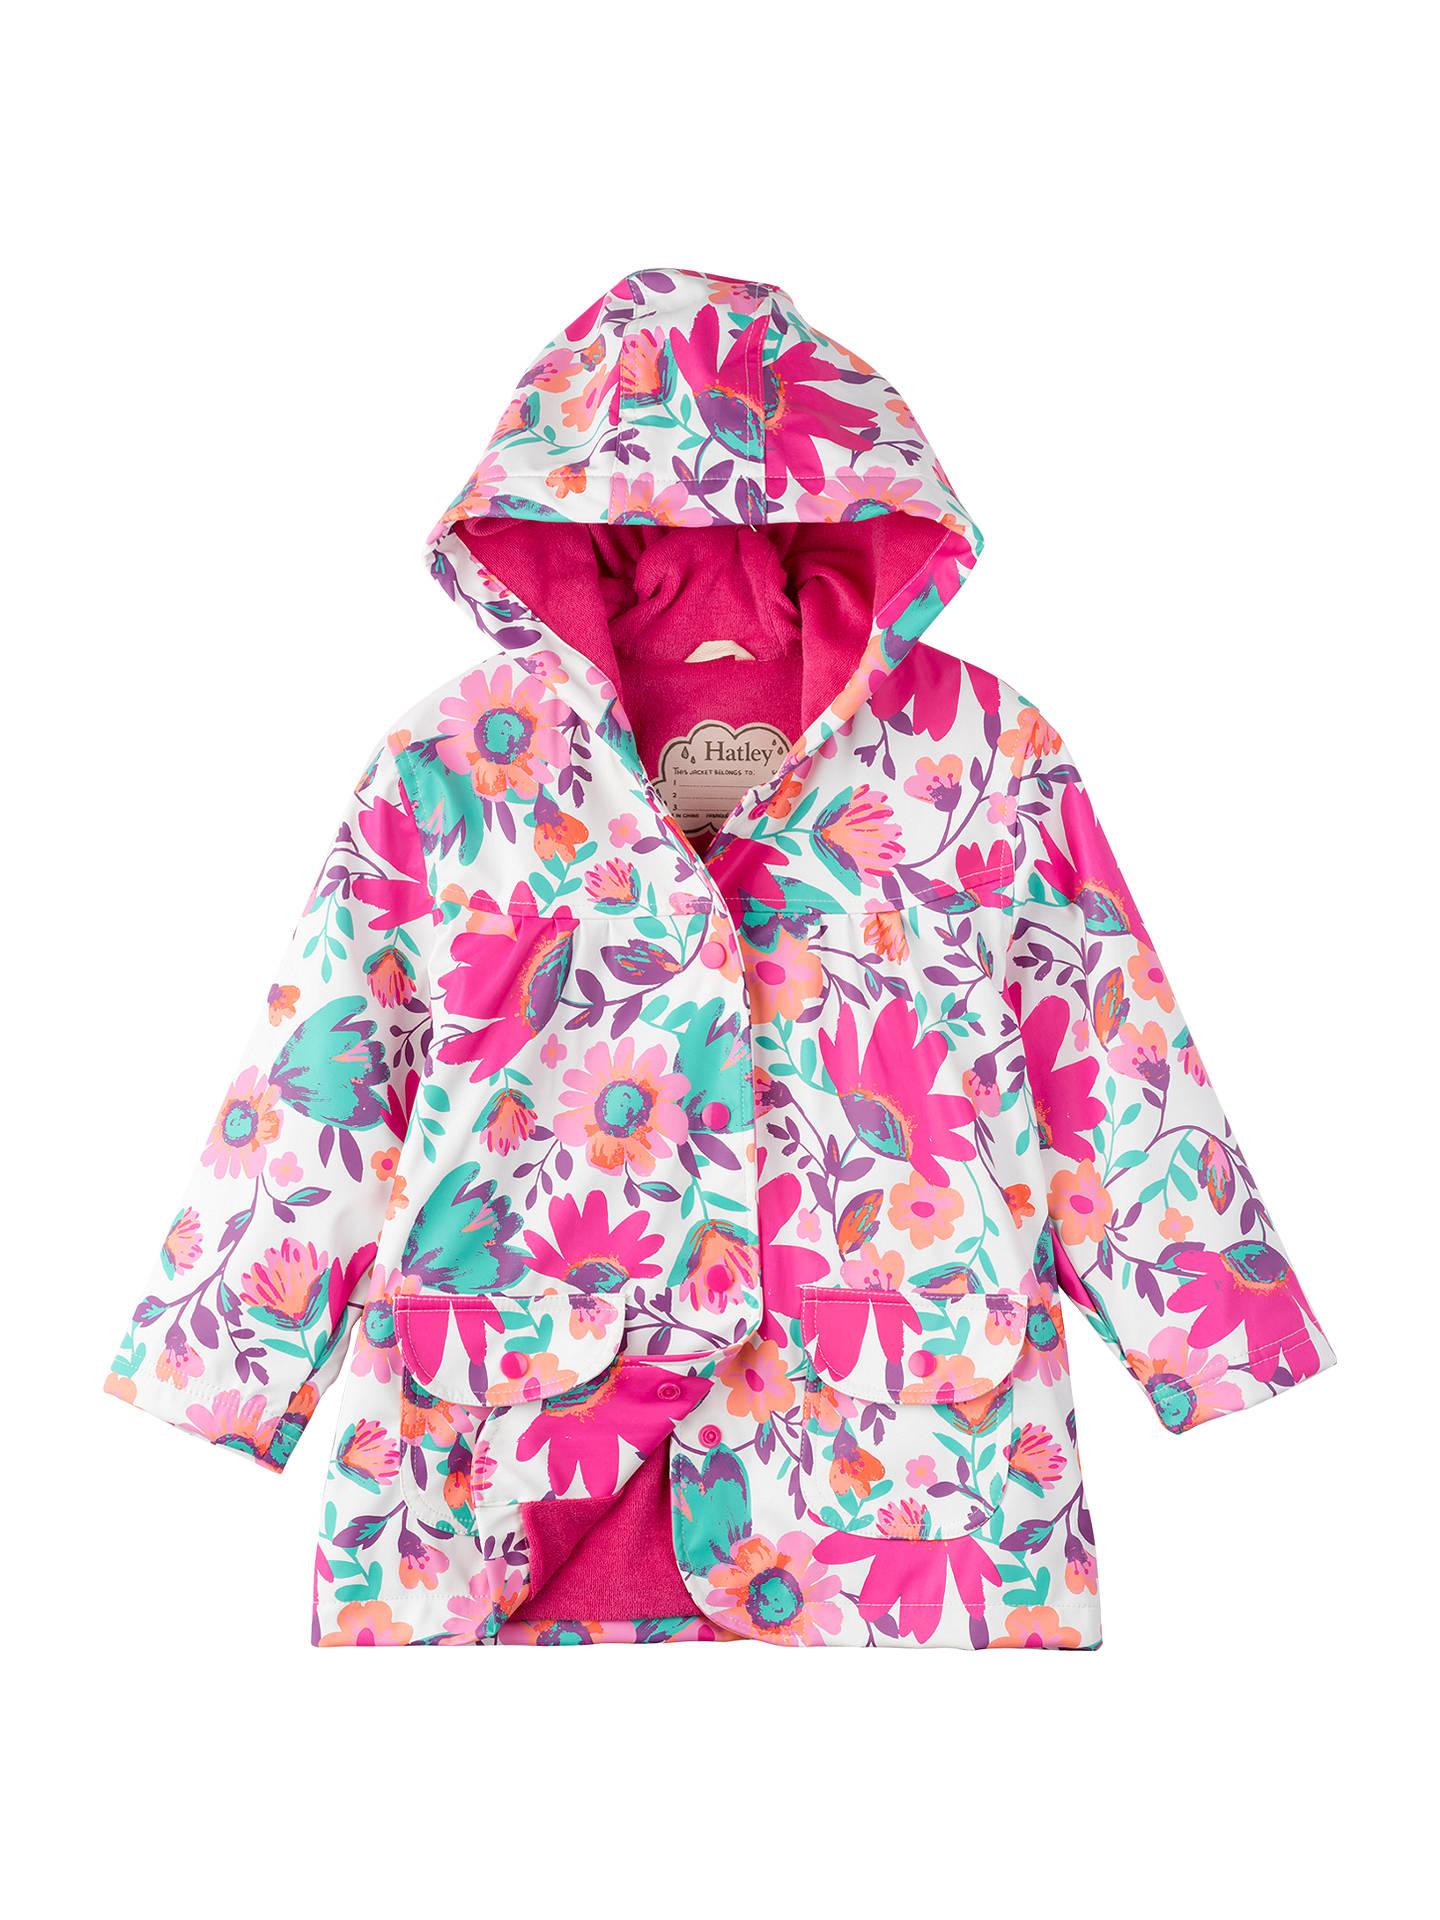 7d414f090 Buy Hatley Girls' Tortuga Bay Floral Raincoat, Pink, 2 years Online at  johnlewis ...